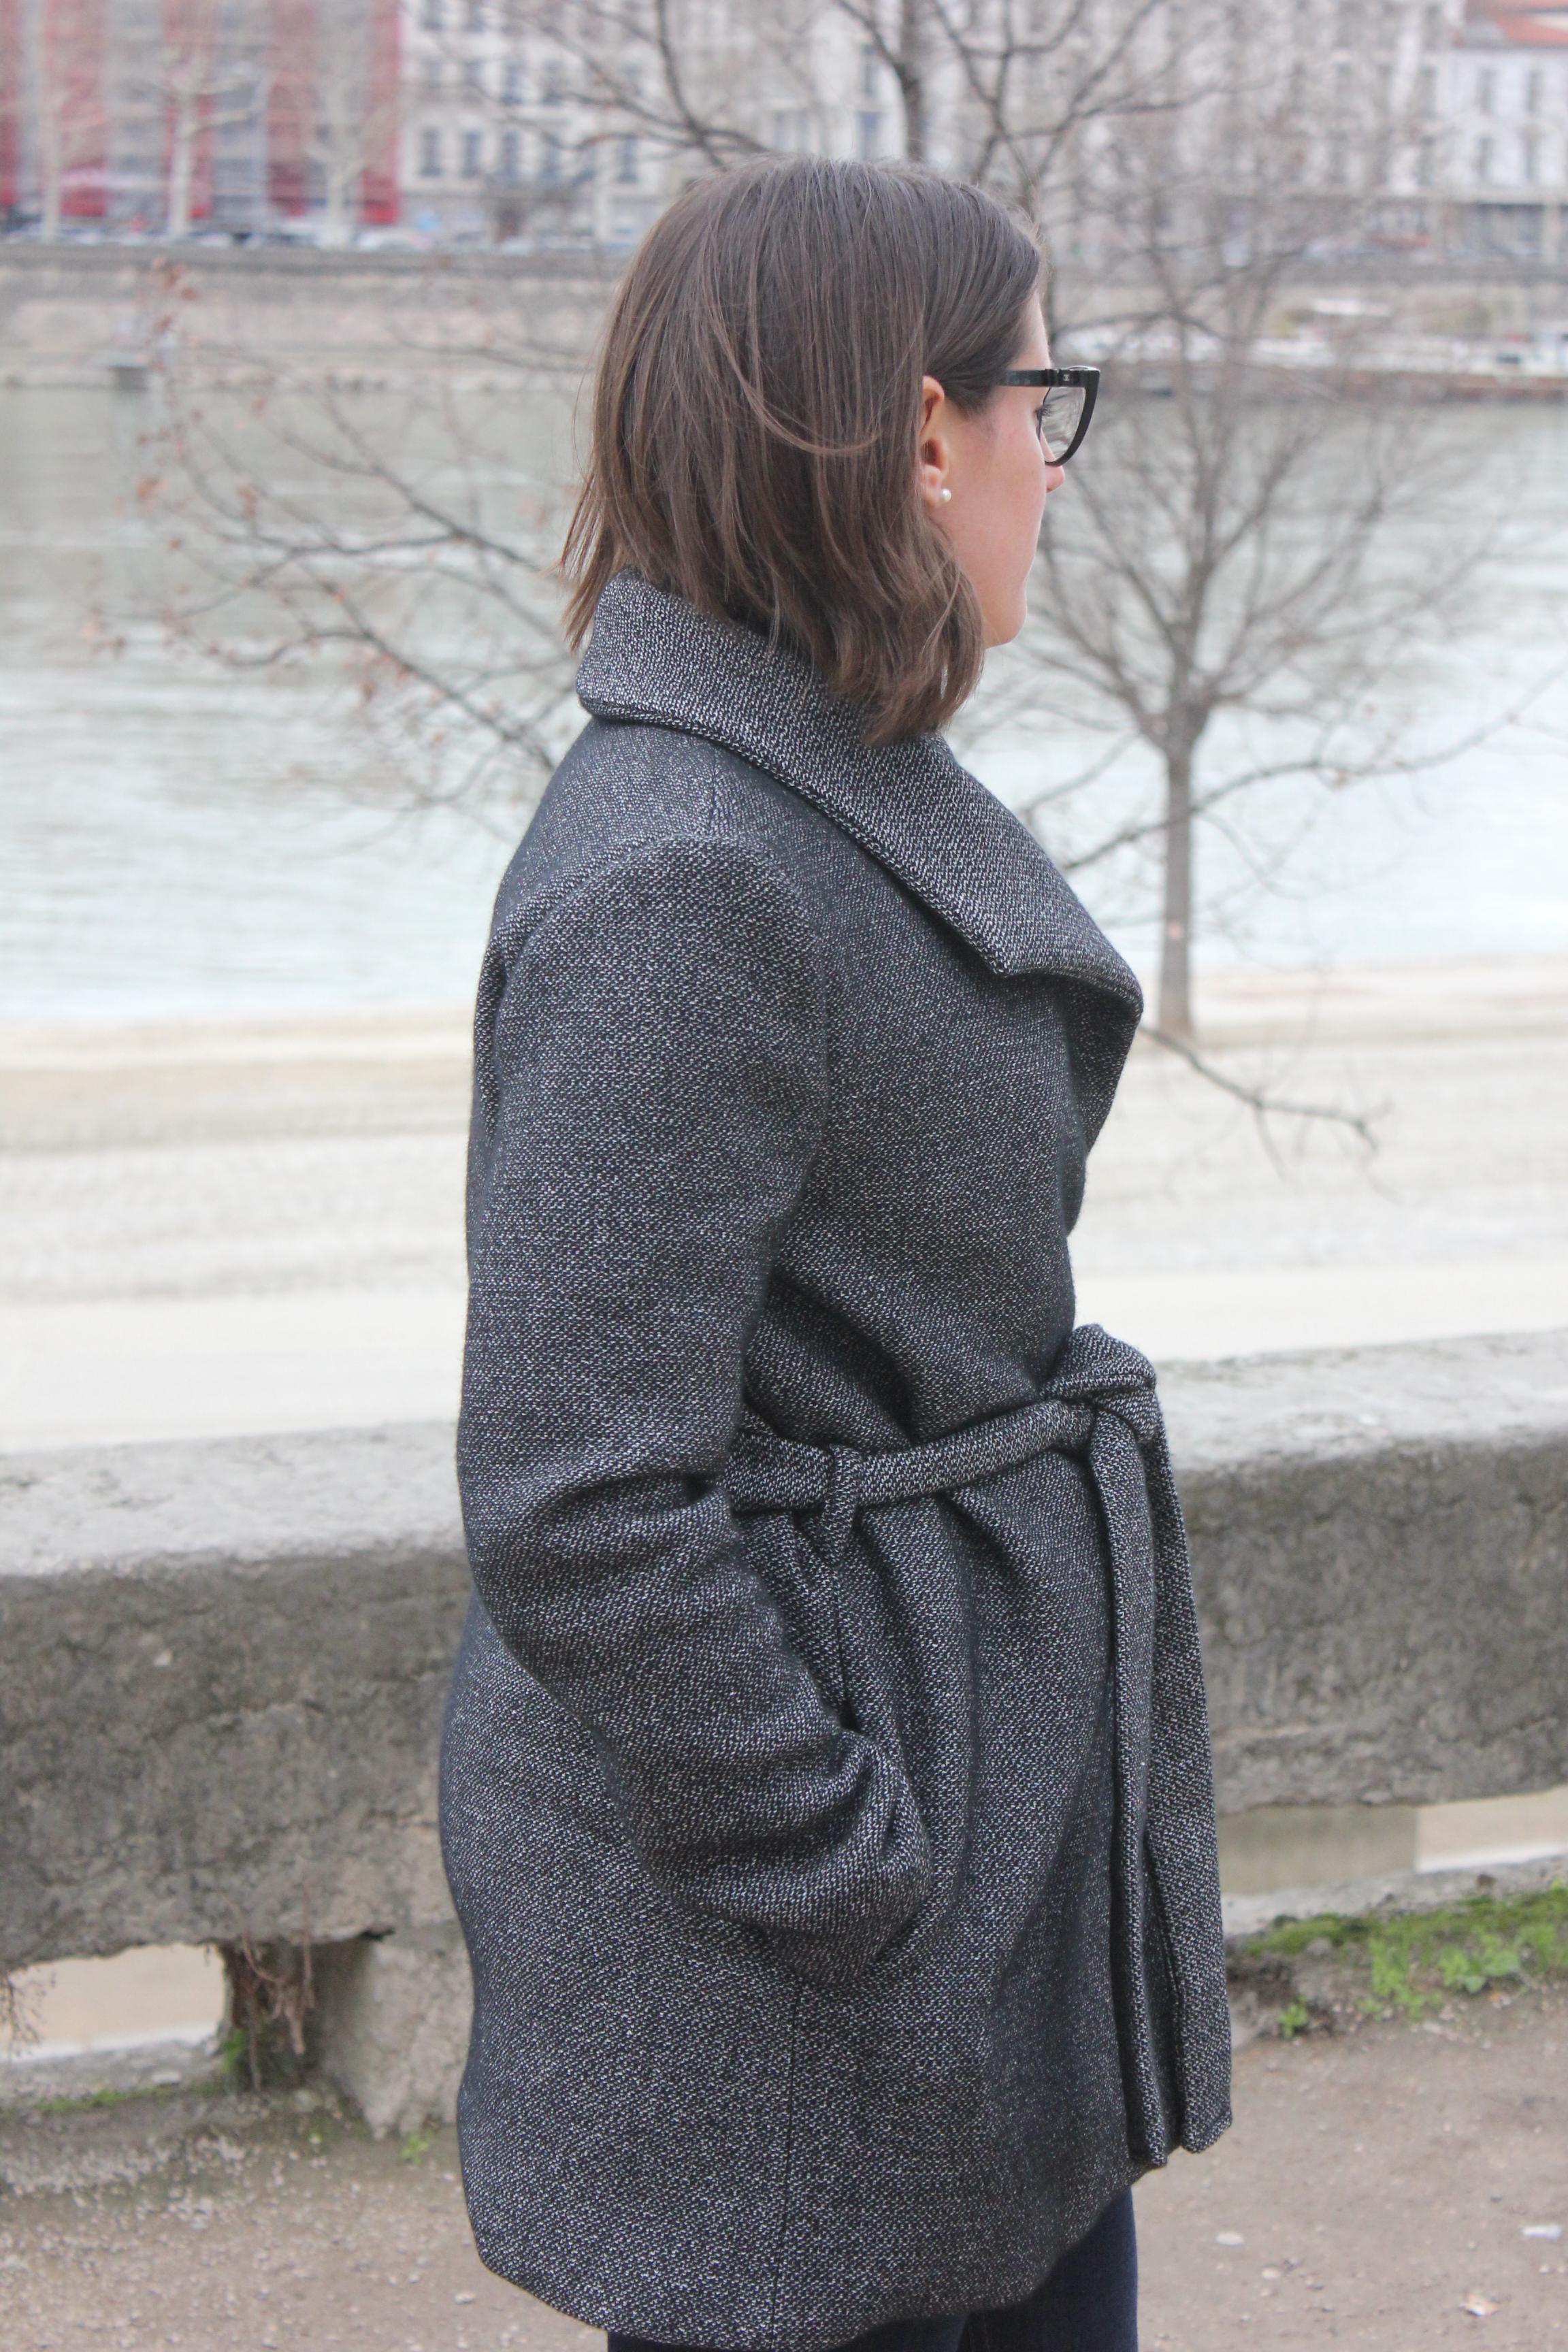 Manteau Nadia - Coralie Bijasson - Blog couture